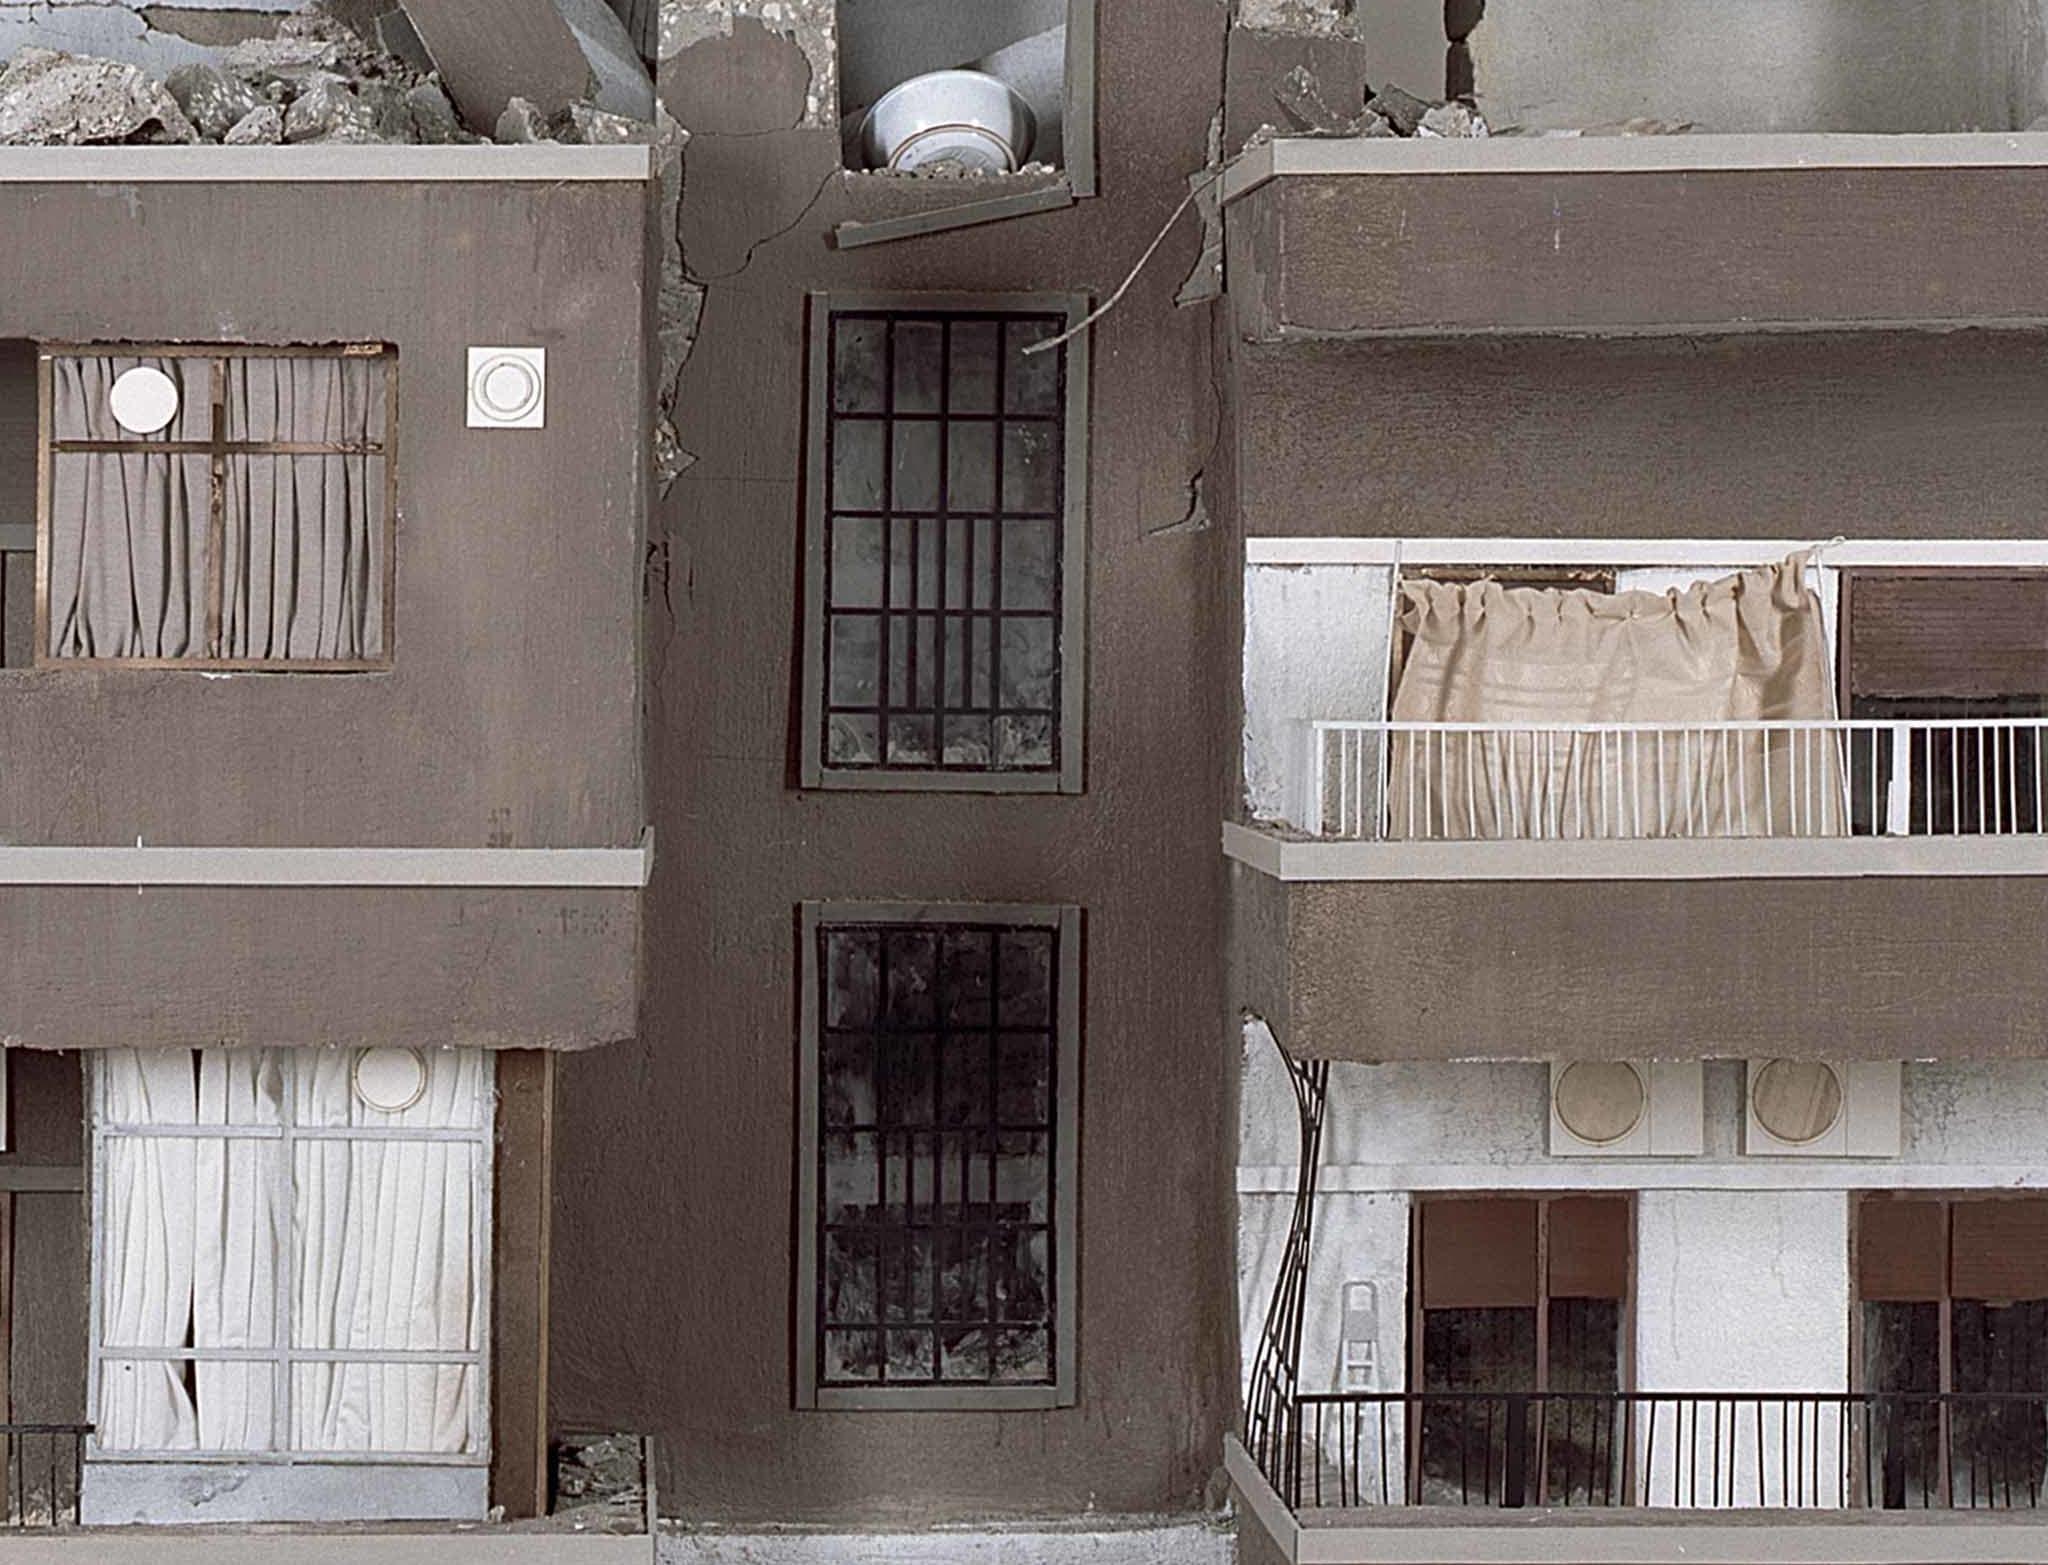 Homesick by Hrair Sarkissian